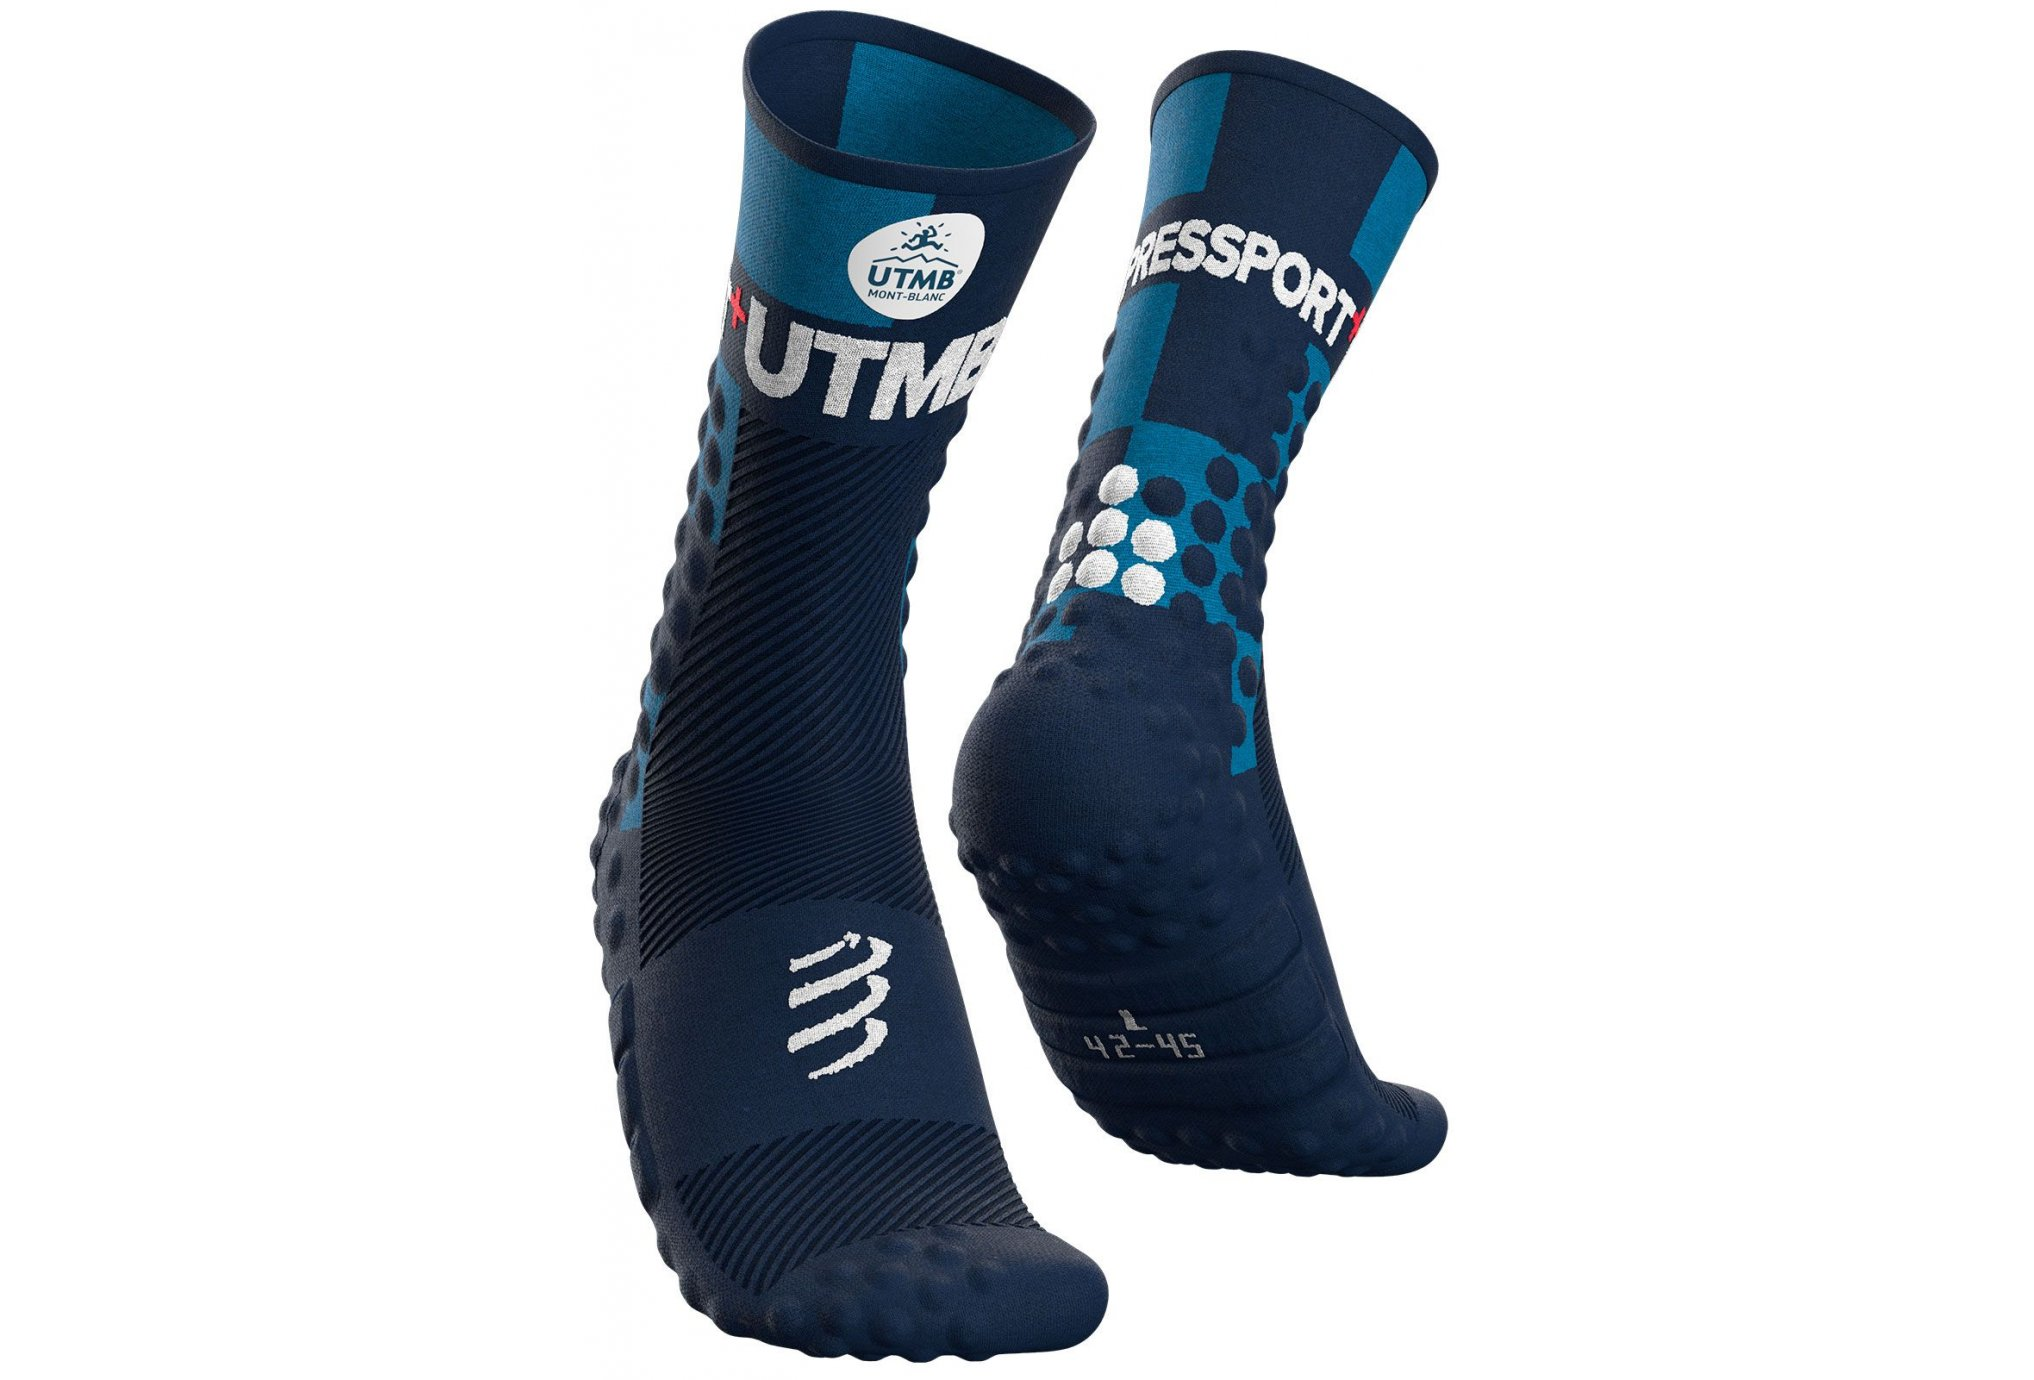 Compressport Pro Racing V 3.0 Ultra Trail UTMB 2021 Chaussettes